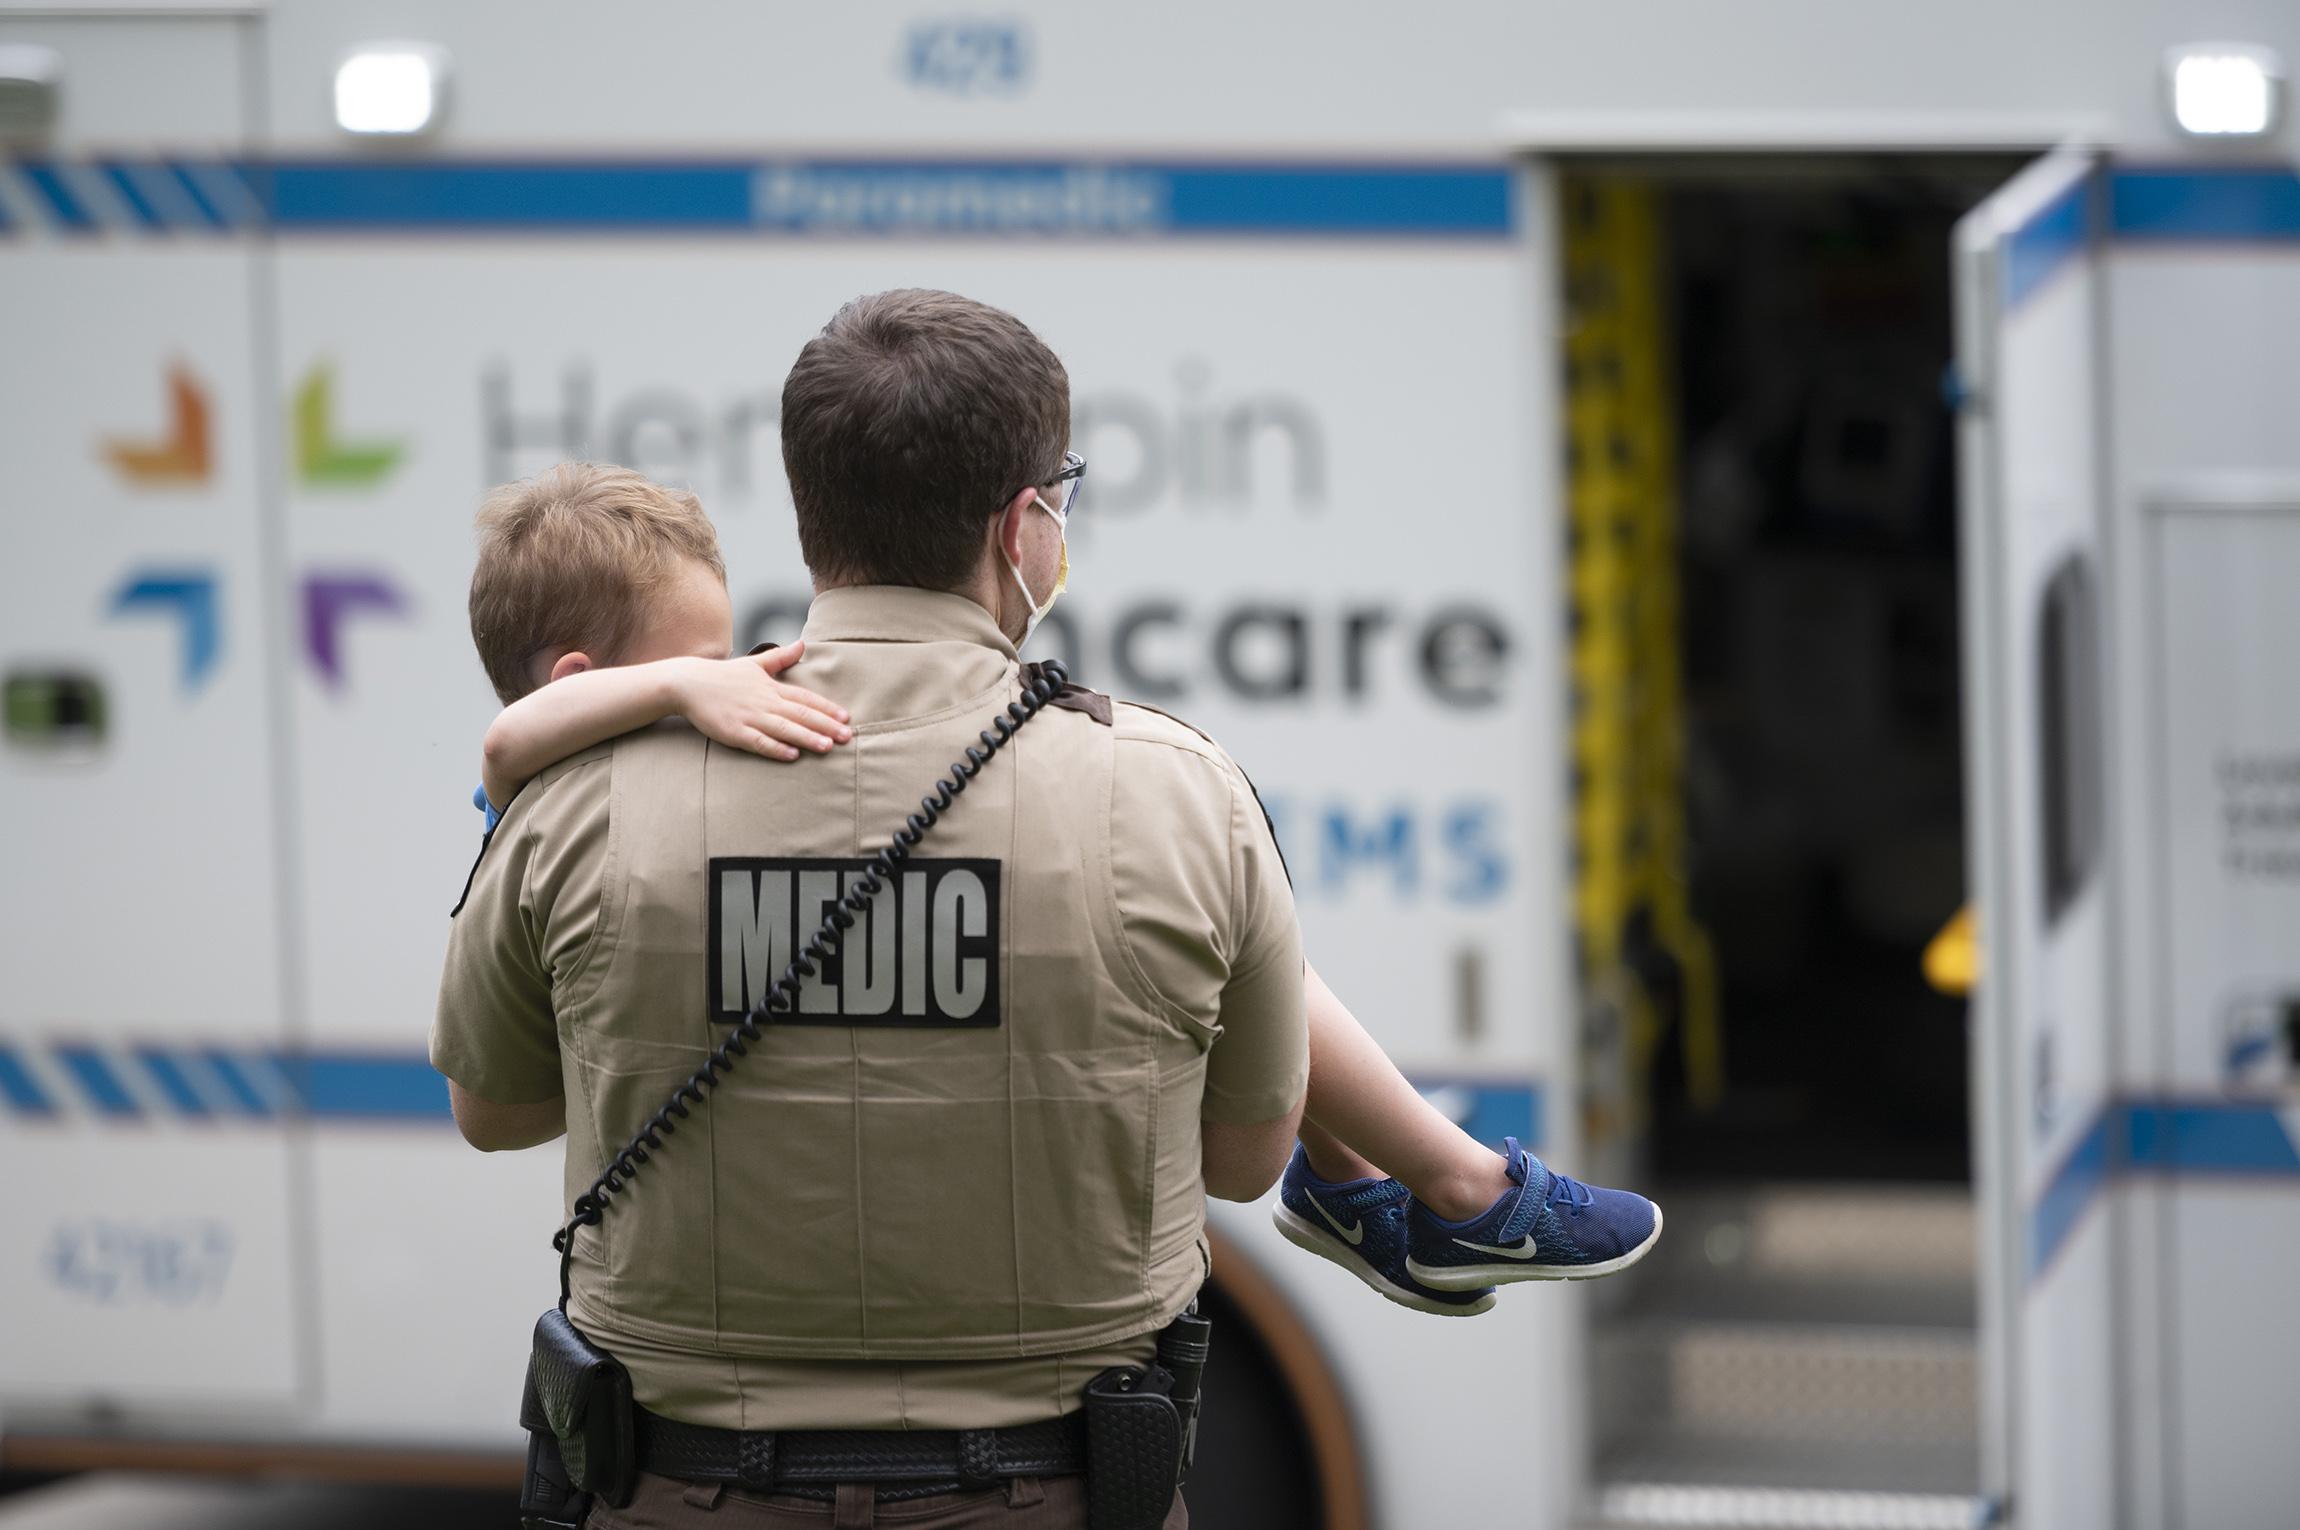 paramedic carrying child to ambulance